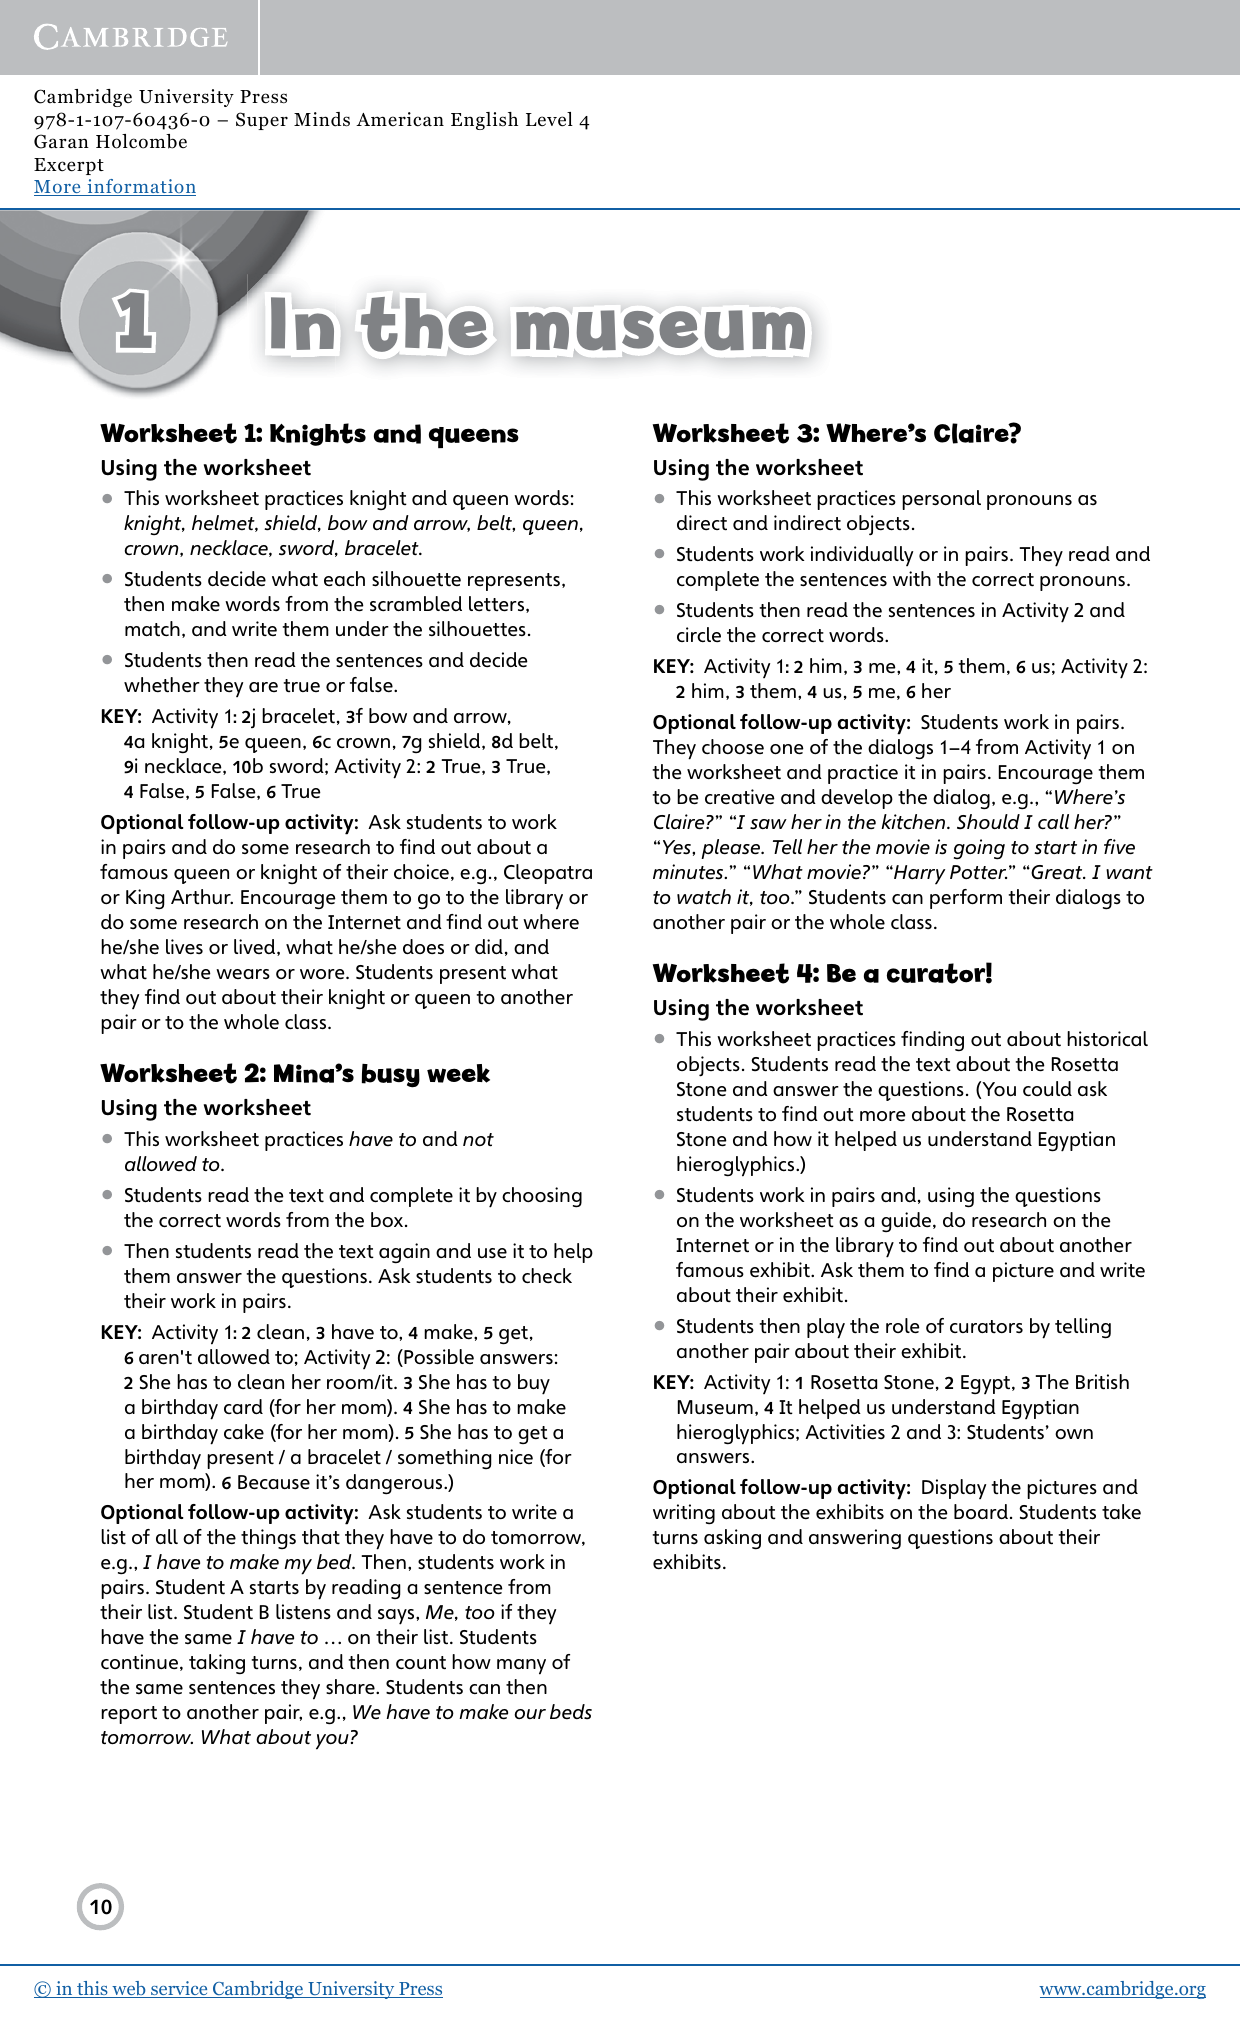 Super Minds American English Level 4 Teachers Resource Book